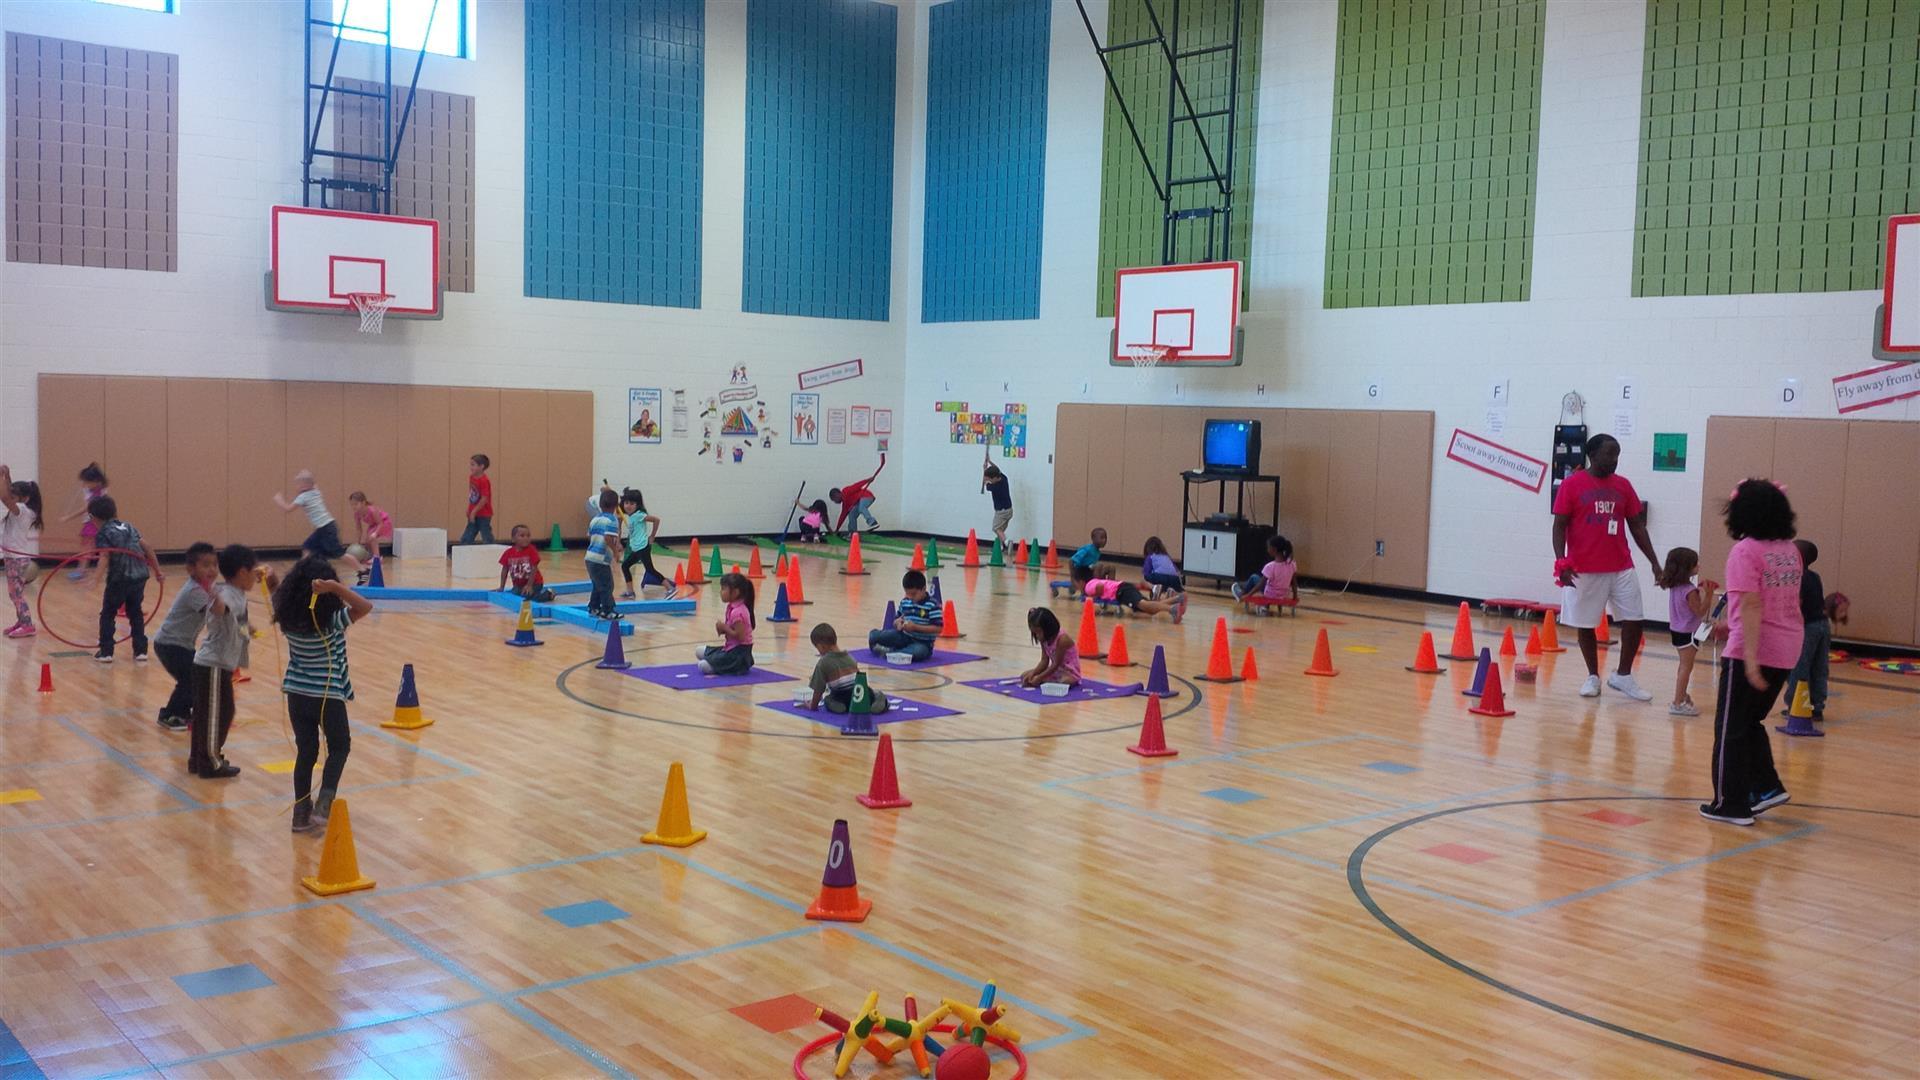 Alton Elementary Brenham (3)